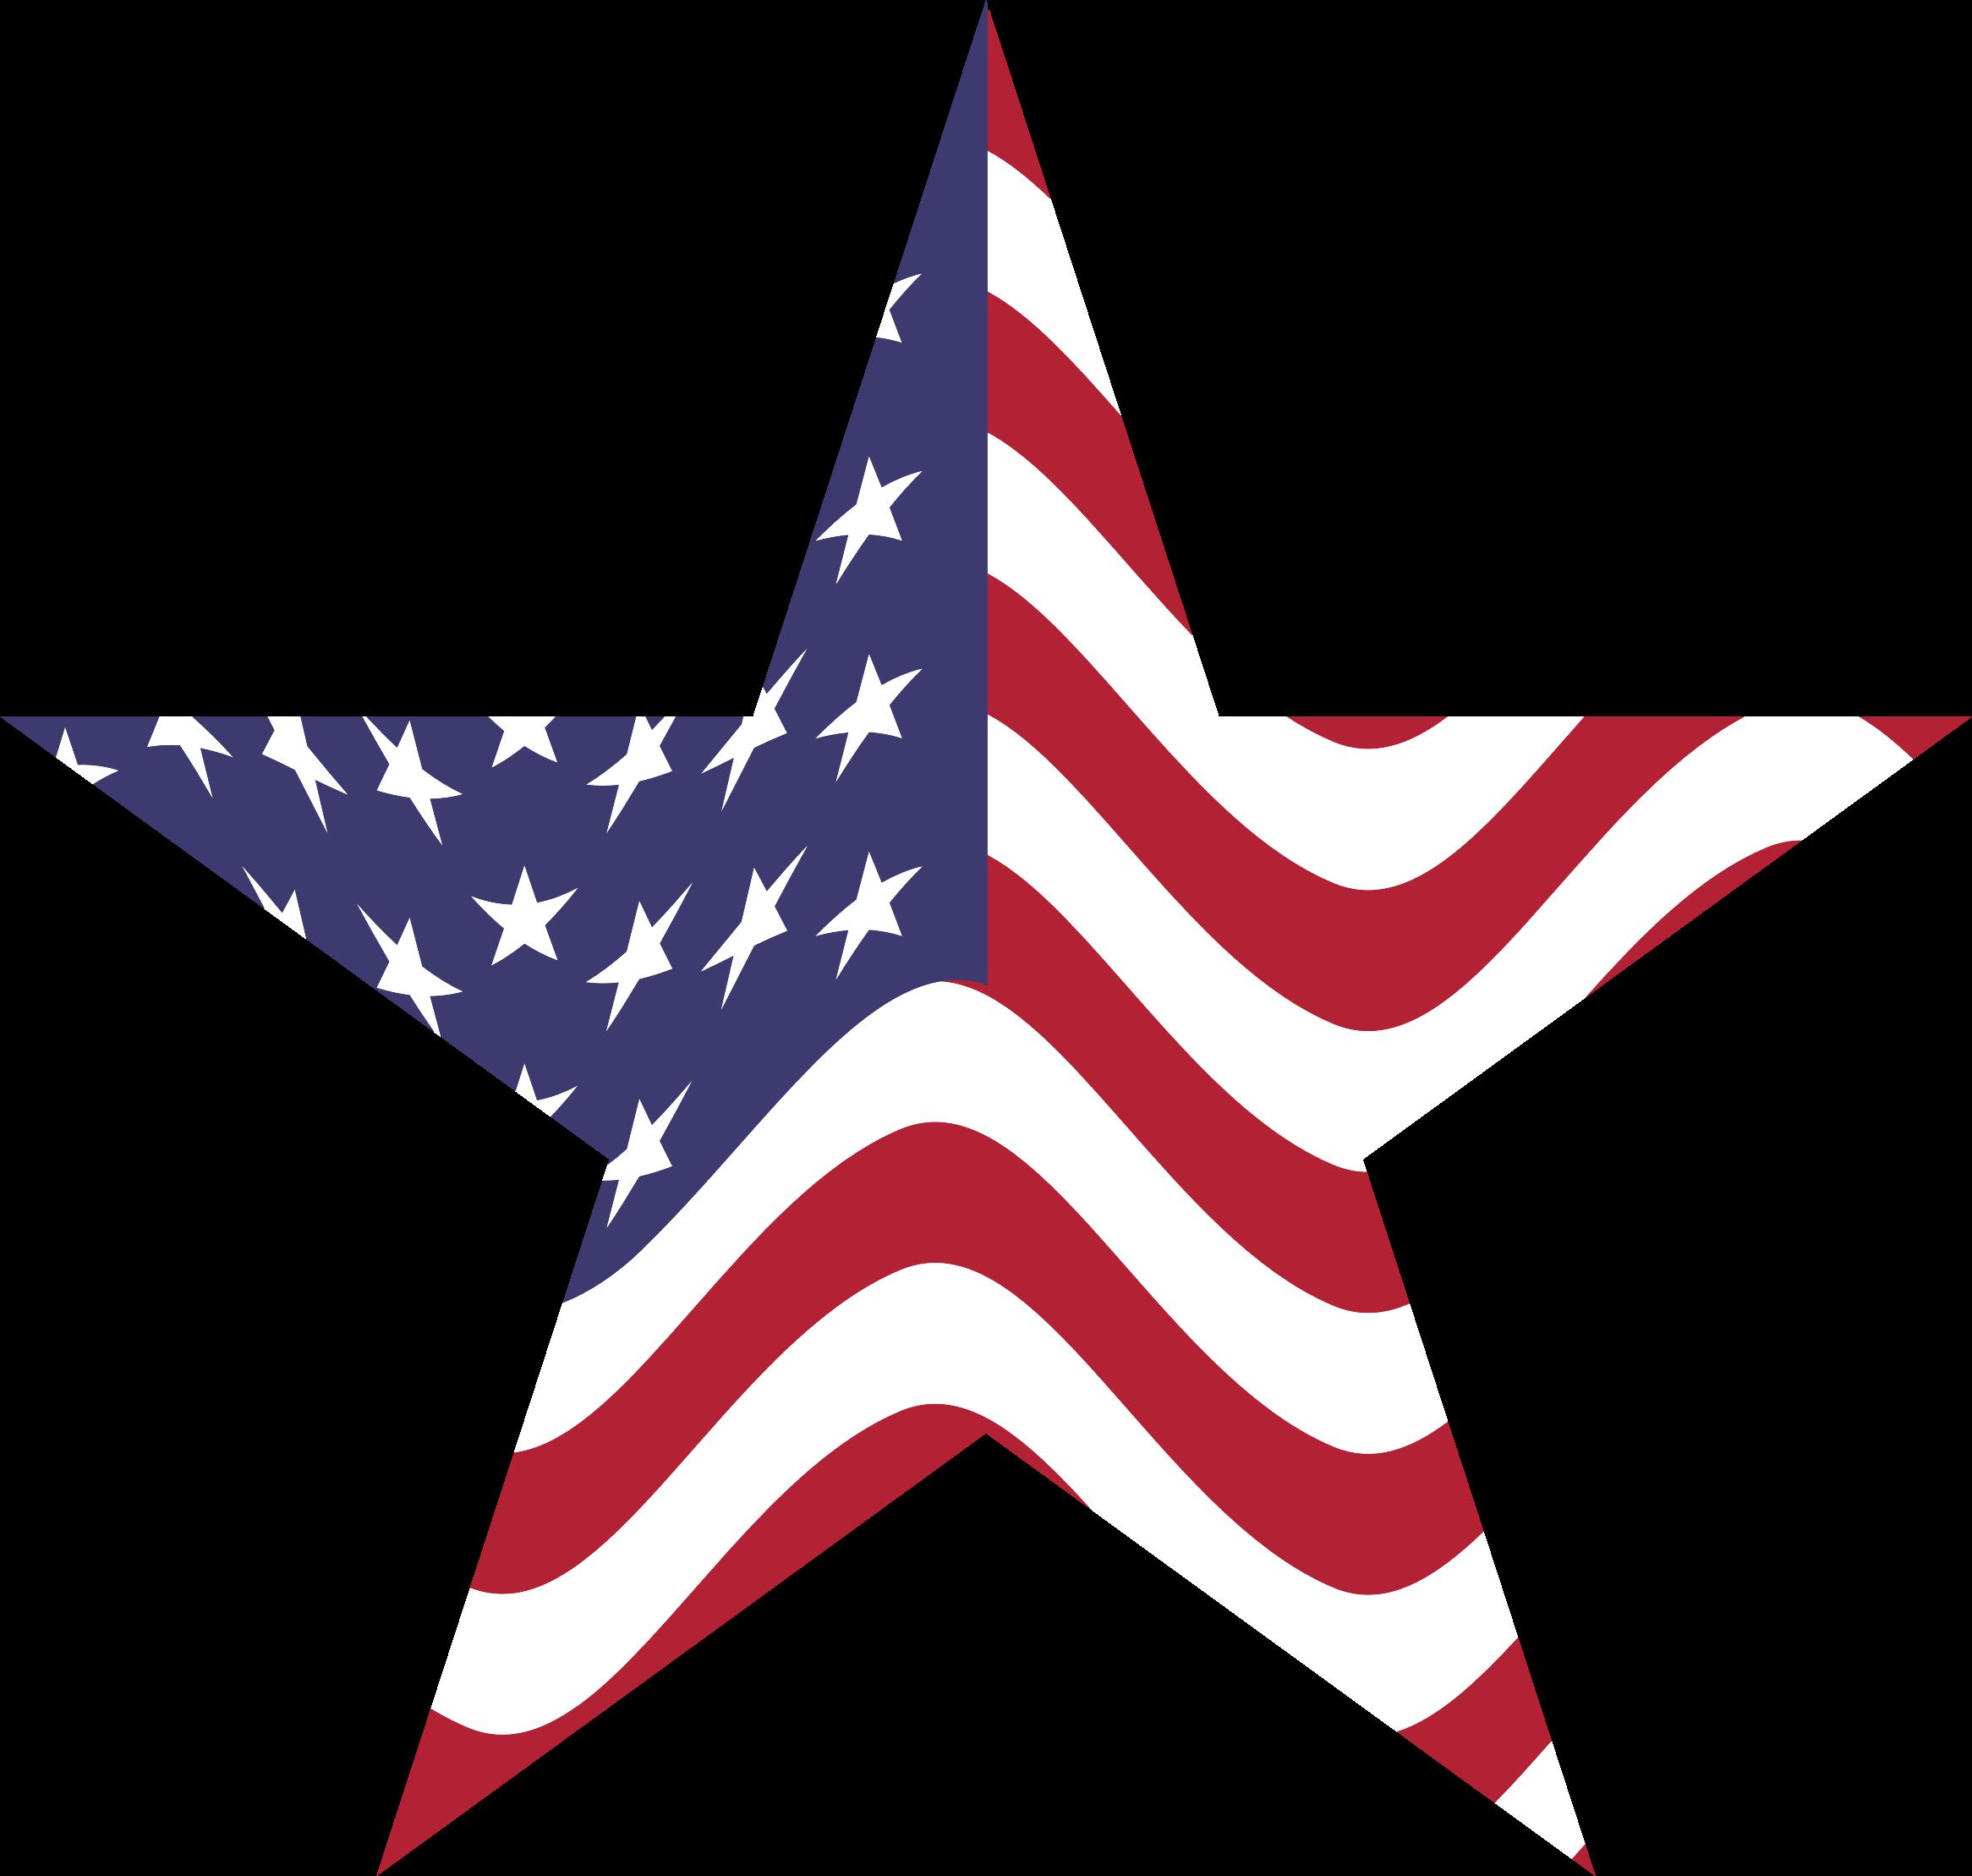 United states flag clip art image royalty free download Us flag american flag united states clipart 3 clipartcow 2 ... image royalty free download